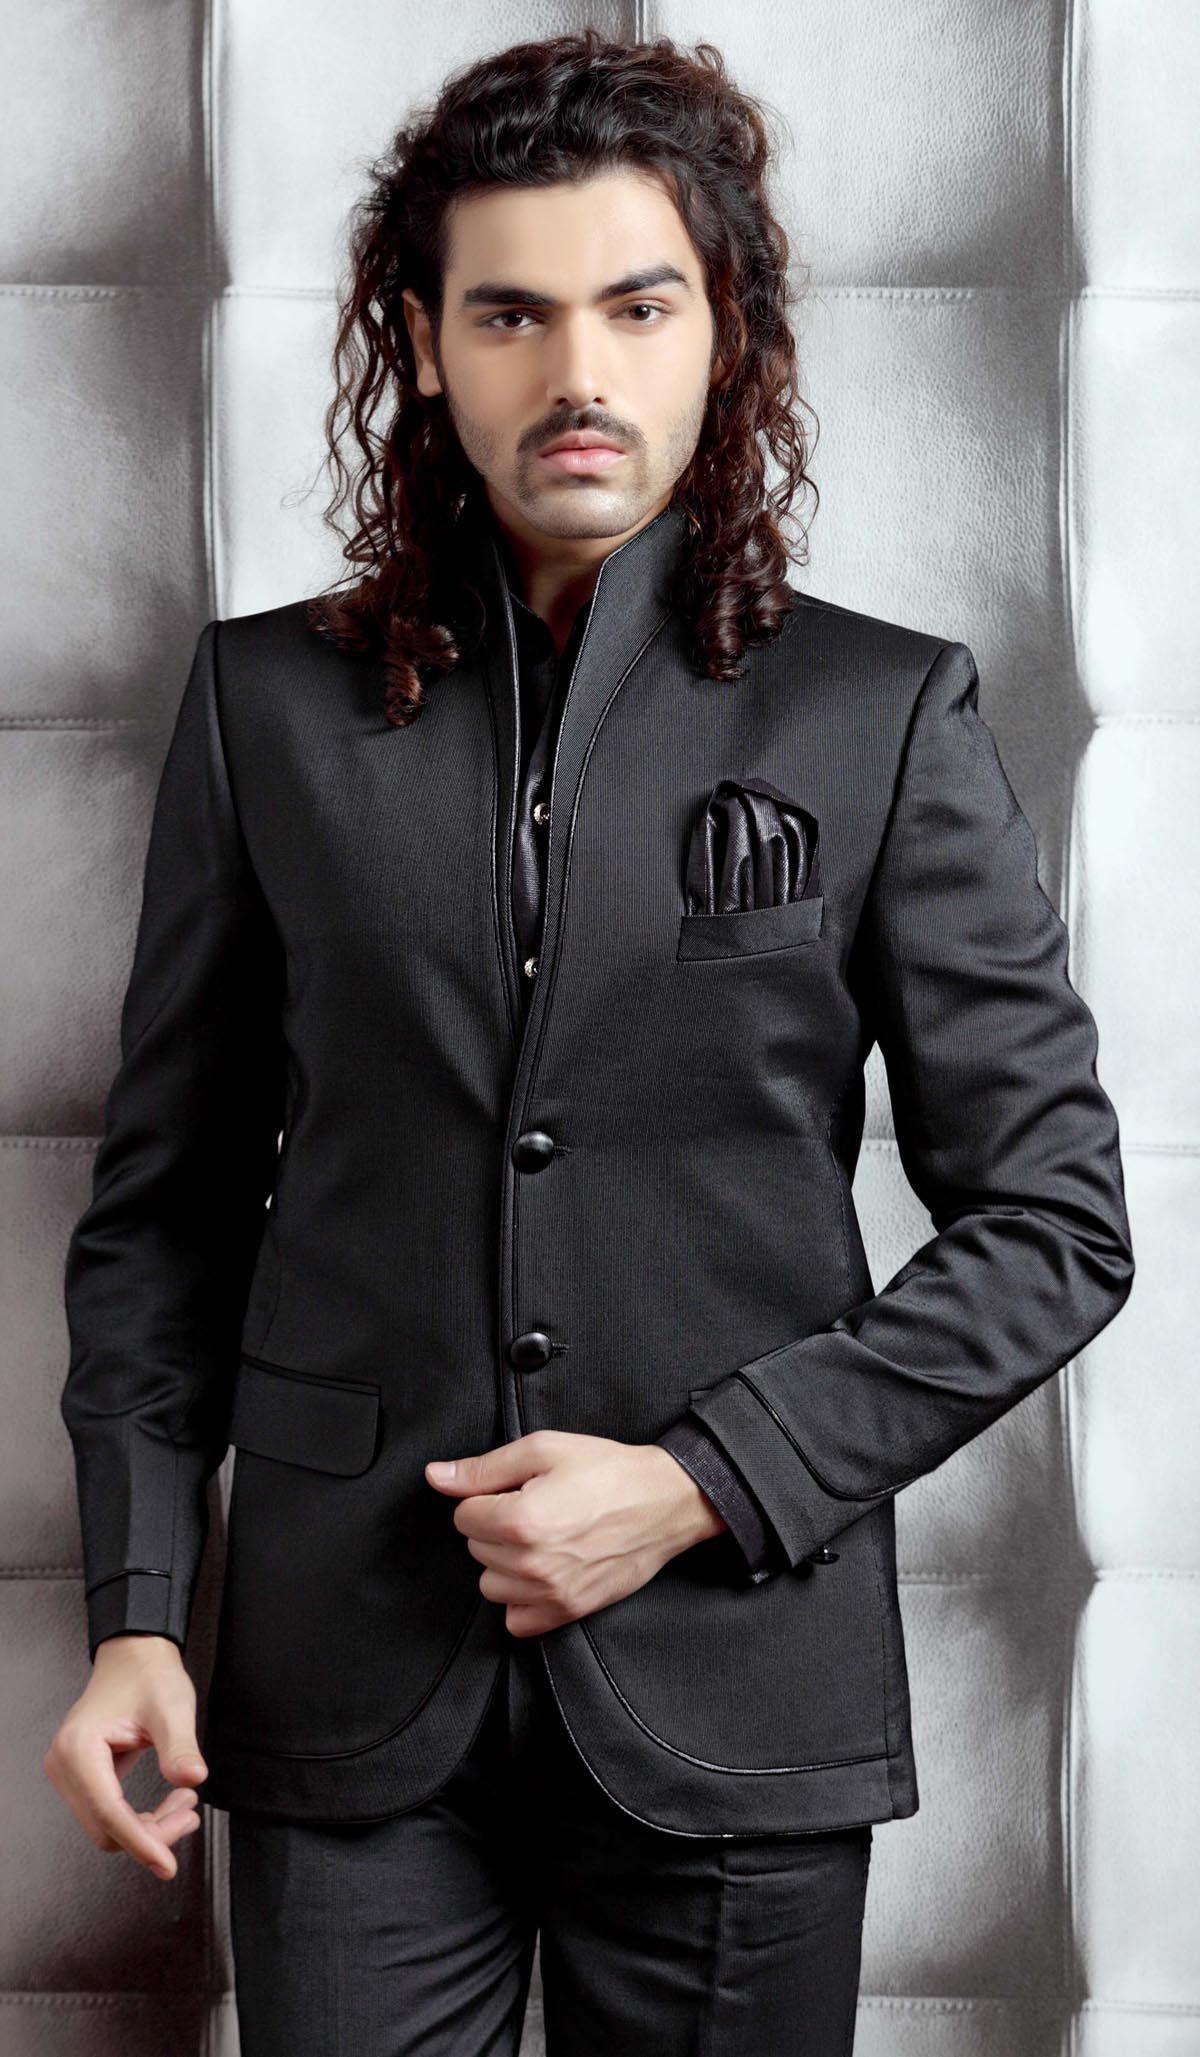 صور بدل رجالي للأفراح والمناسبات احدث موديلات البدل ميكساتك Reception Suits Designer Suits For Men Mens Fashion Suits